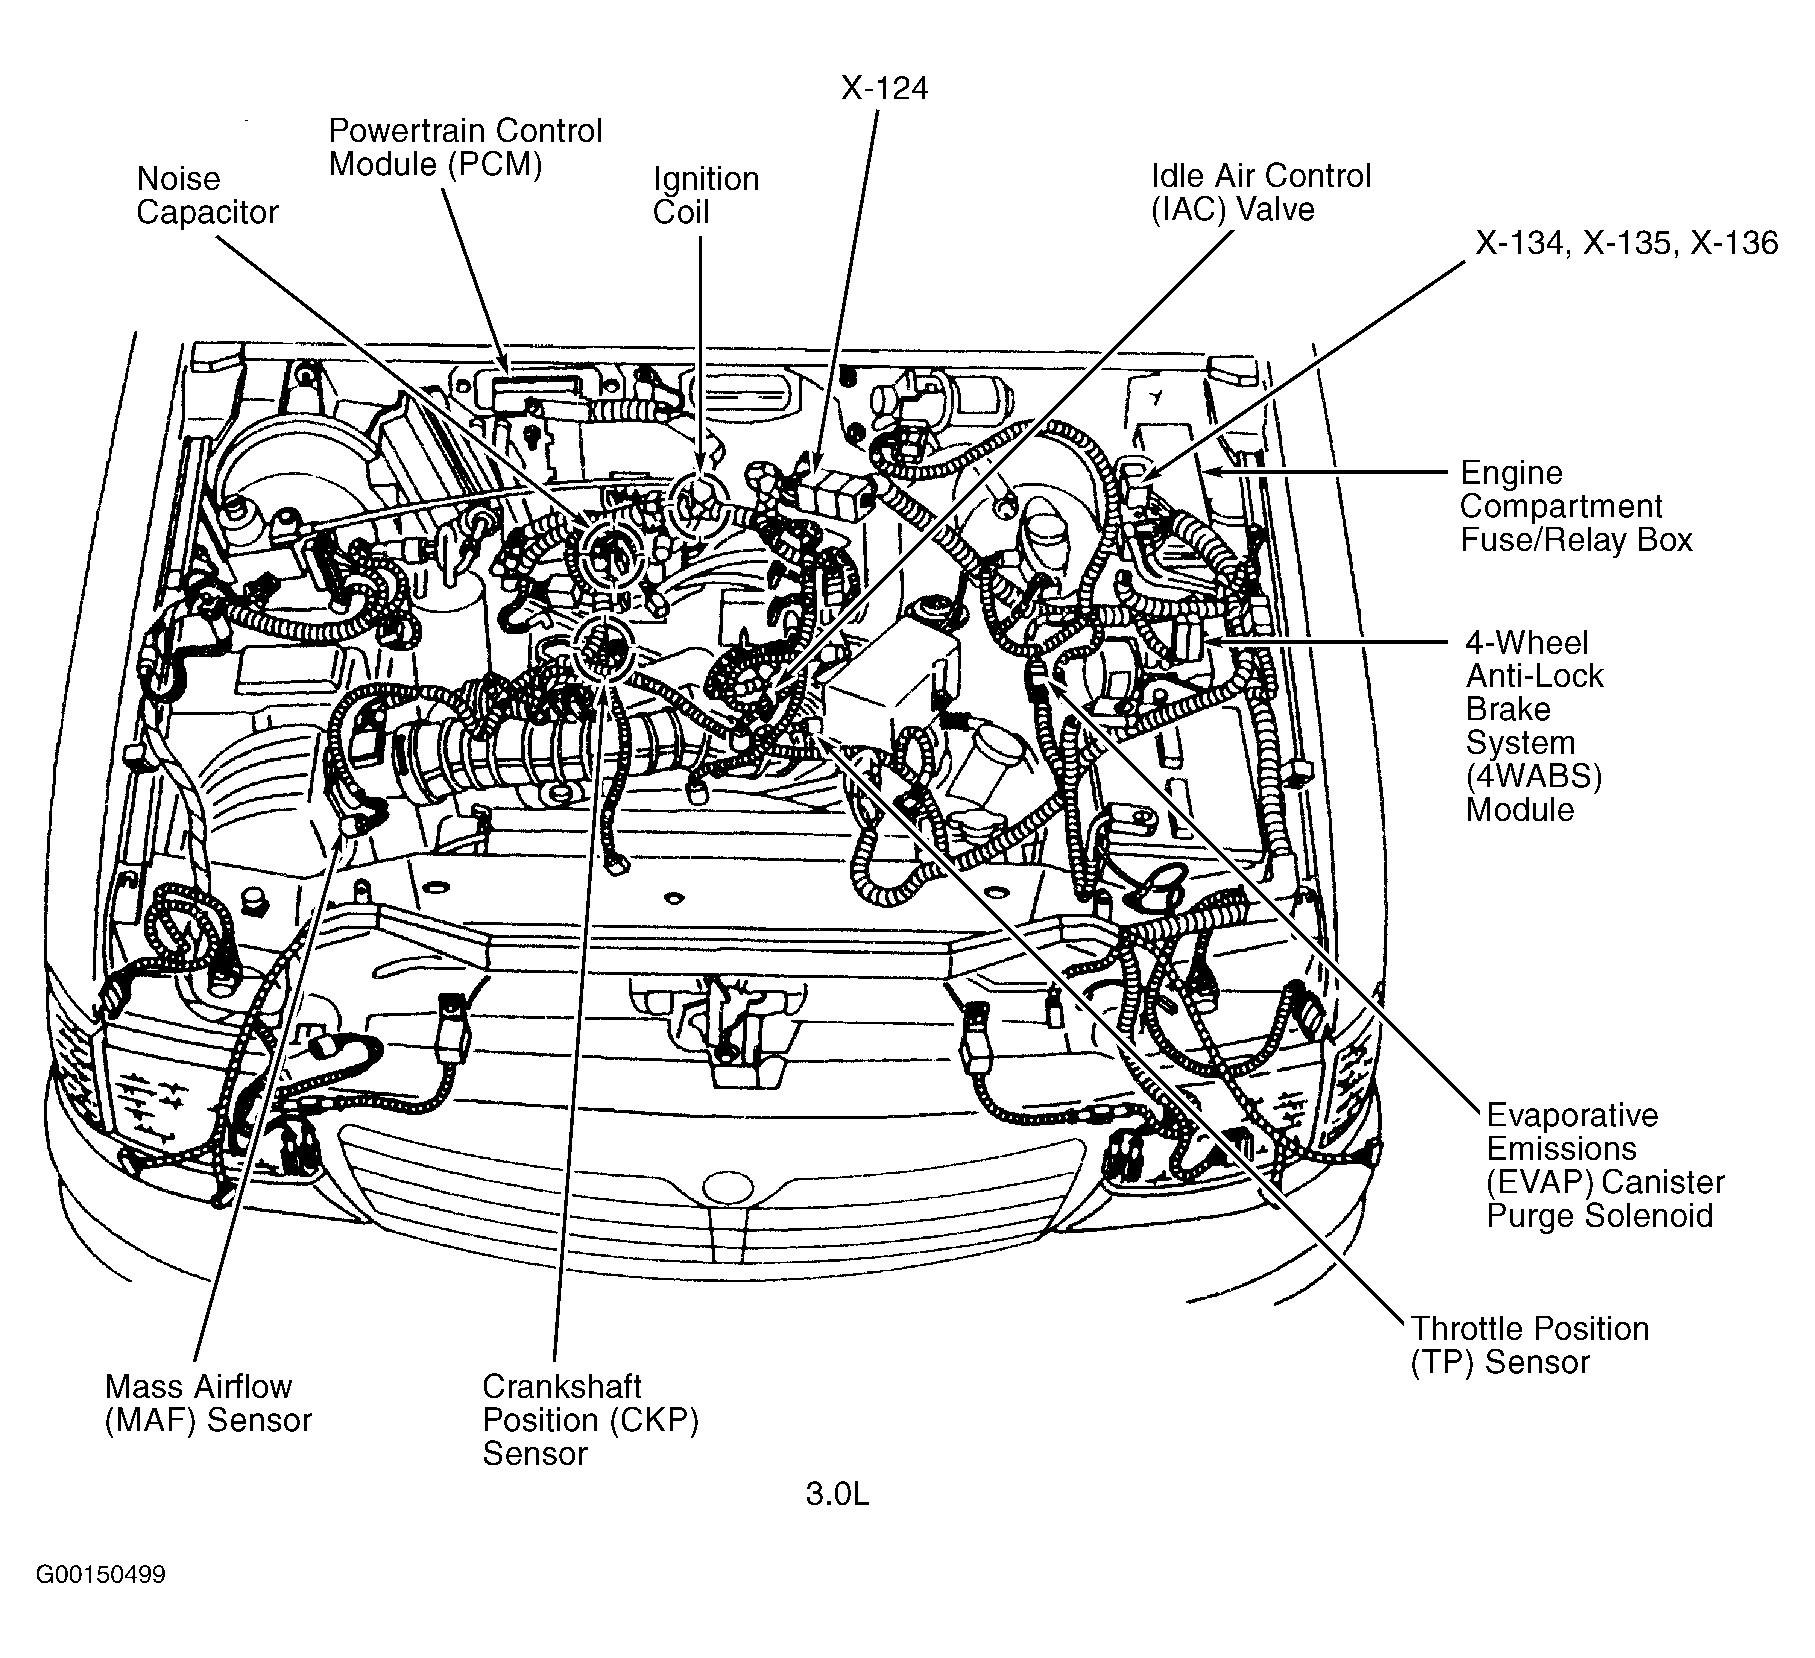 Bmw 318i Engine Diagram 1998 Bmw 318i Wiring Diagram Of Bmw 318i Engine Diagram Sundowner Wiring Diagram Wiring Diagram Datasource